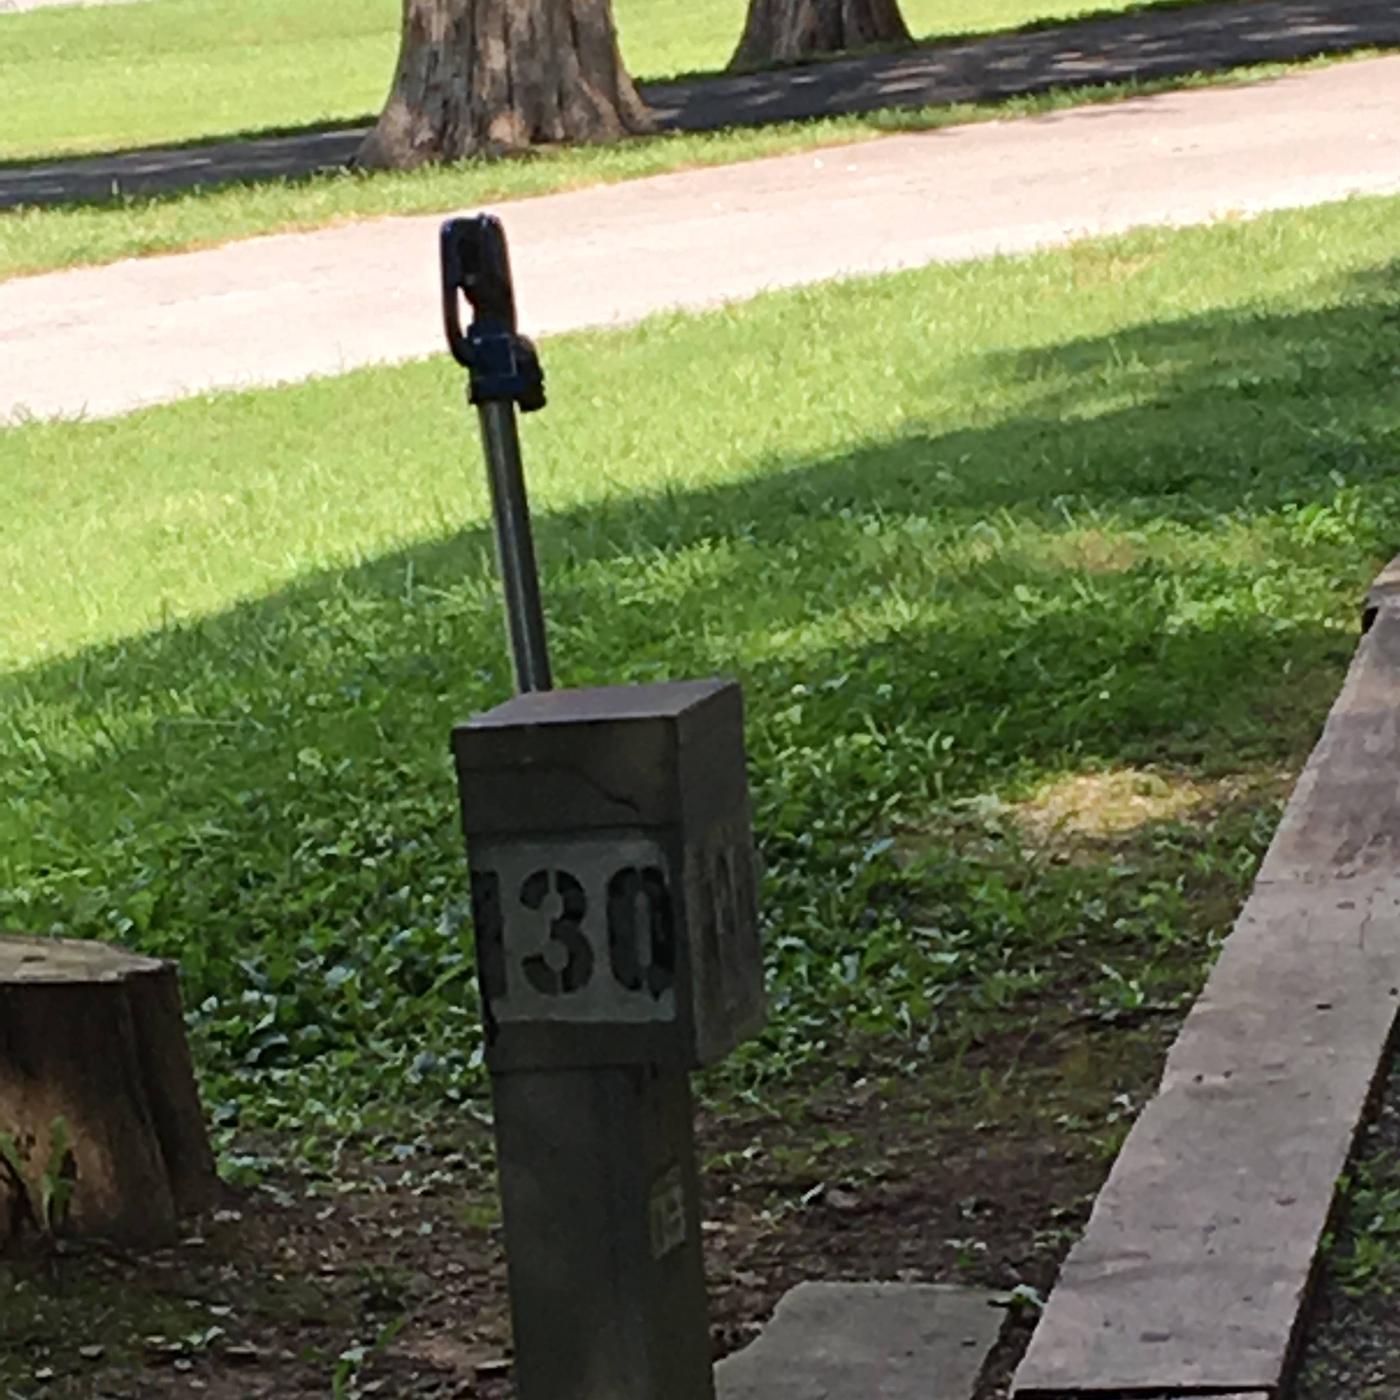 OBEY RIVER PARK SITE #130 UTILITIESOBEY RIVER PARK SITE #130